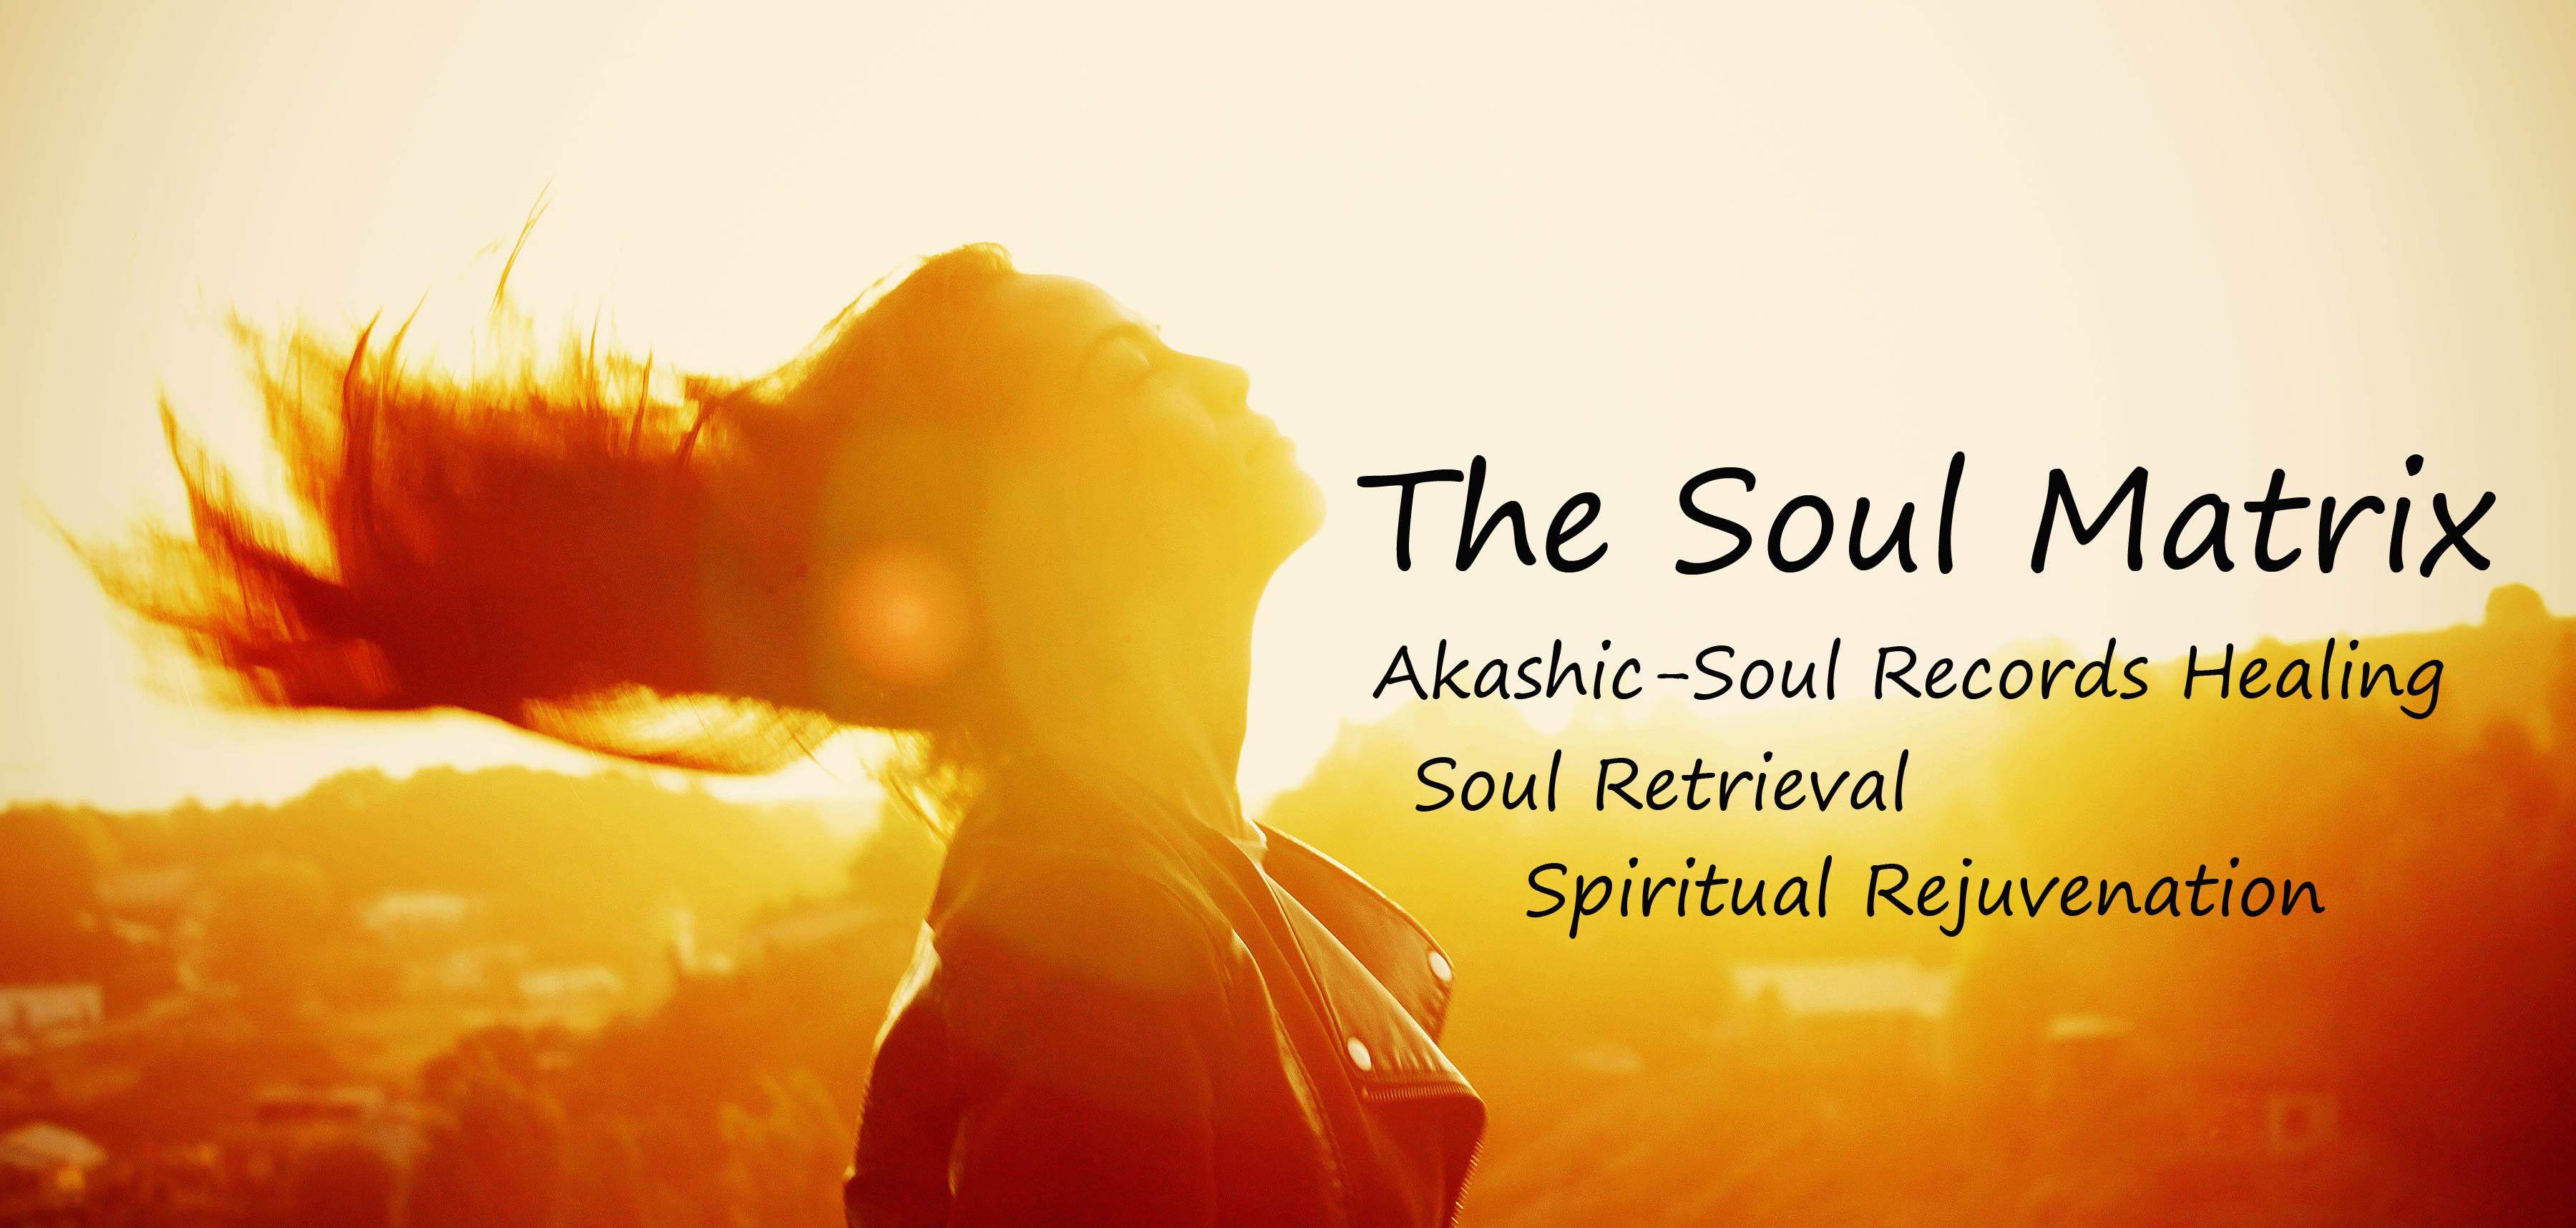 Soul Matrix Healing